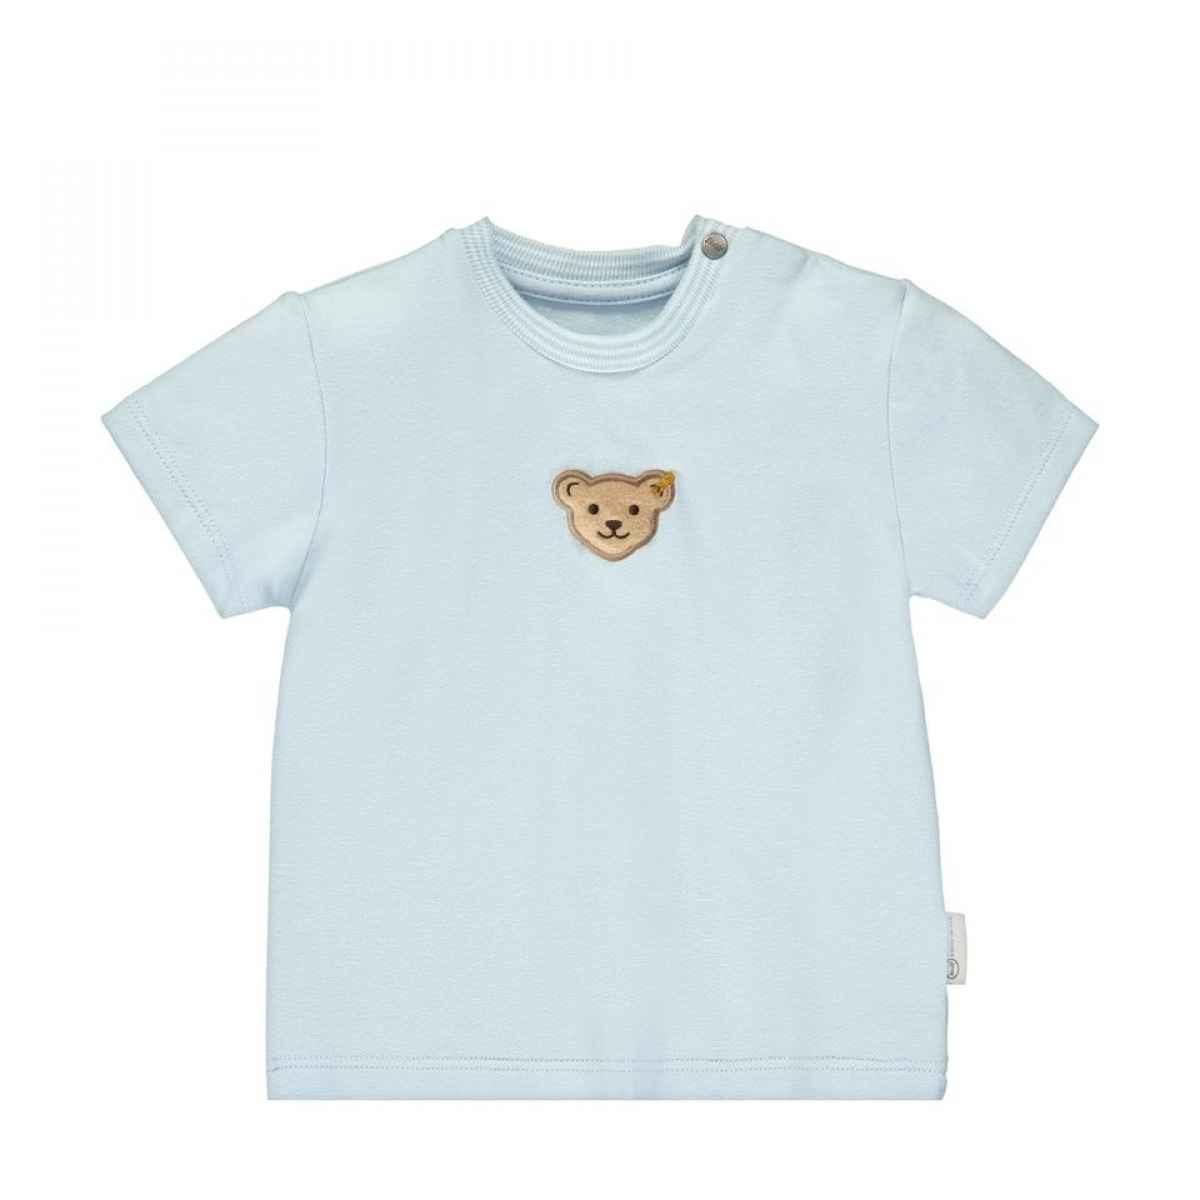 Steiff Steiff Pale Blue T-shirt With Teddy